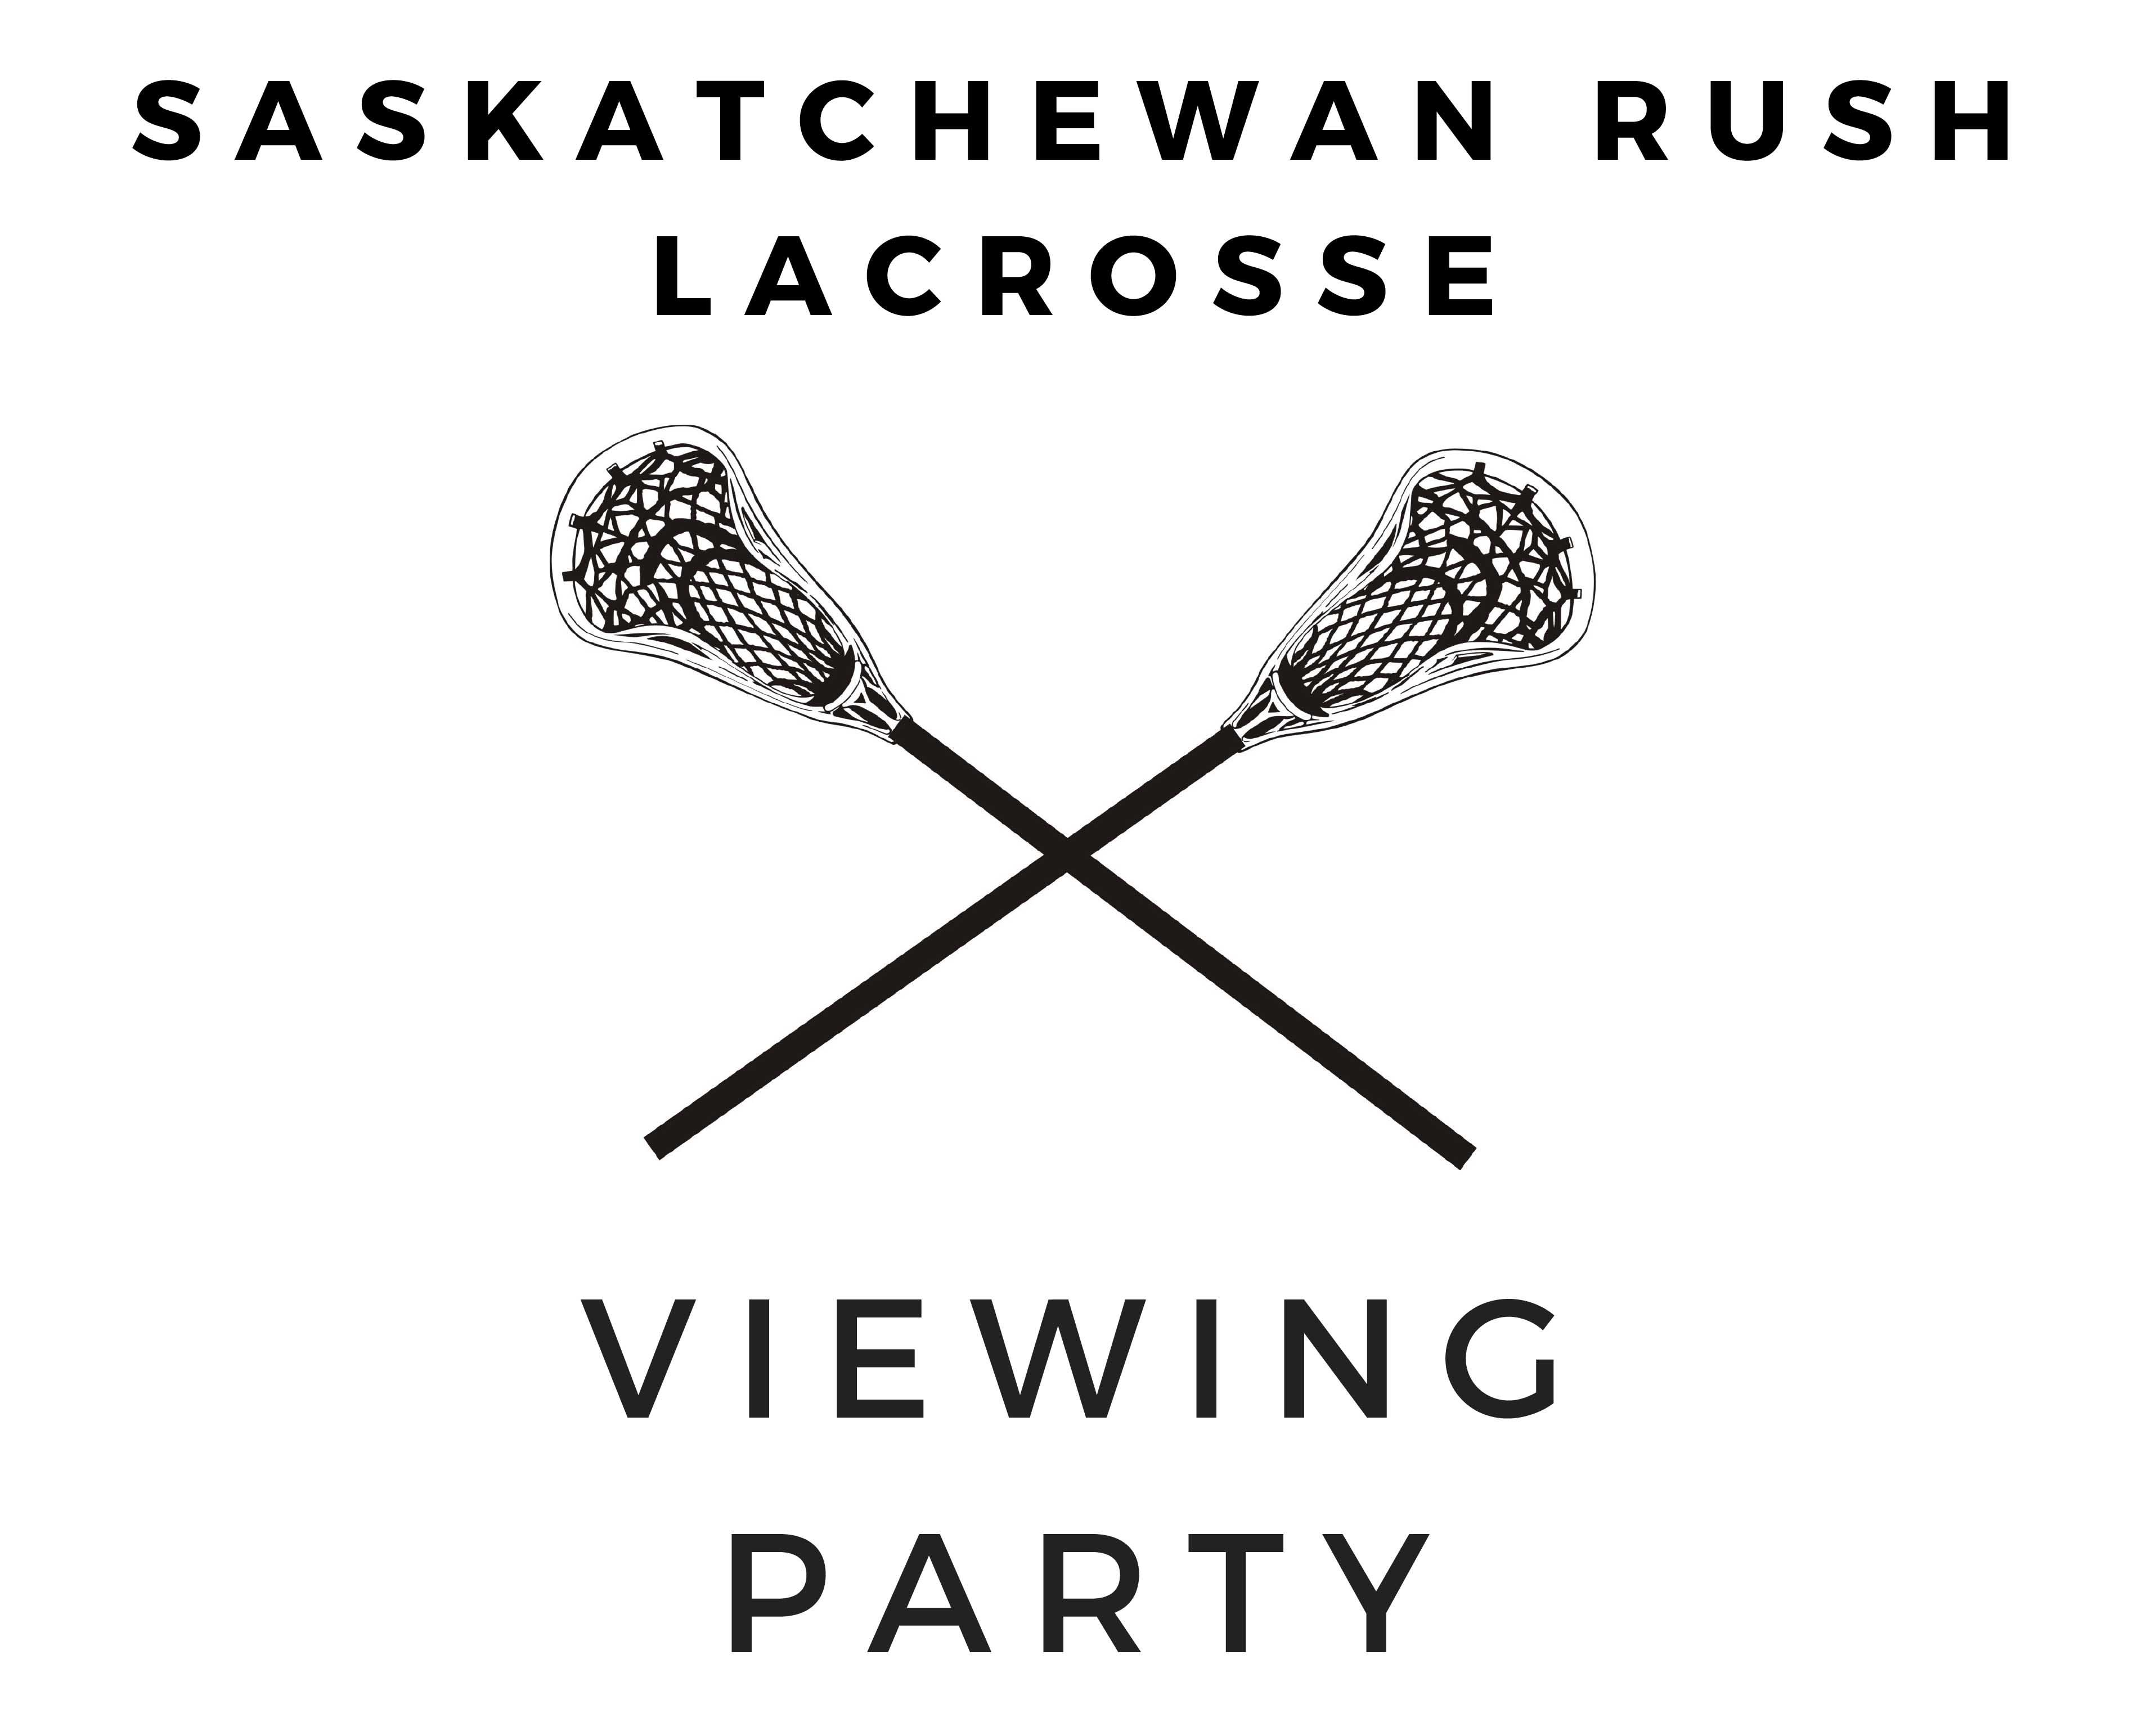 Saskatchewan Rush Lacrosse Viewing Party